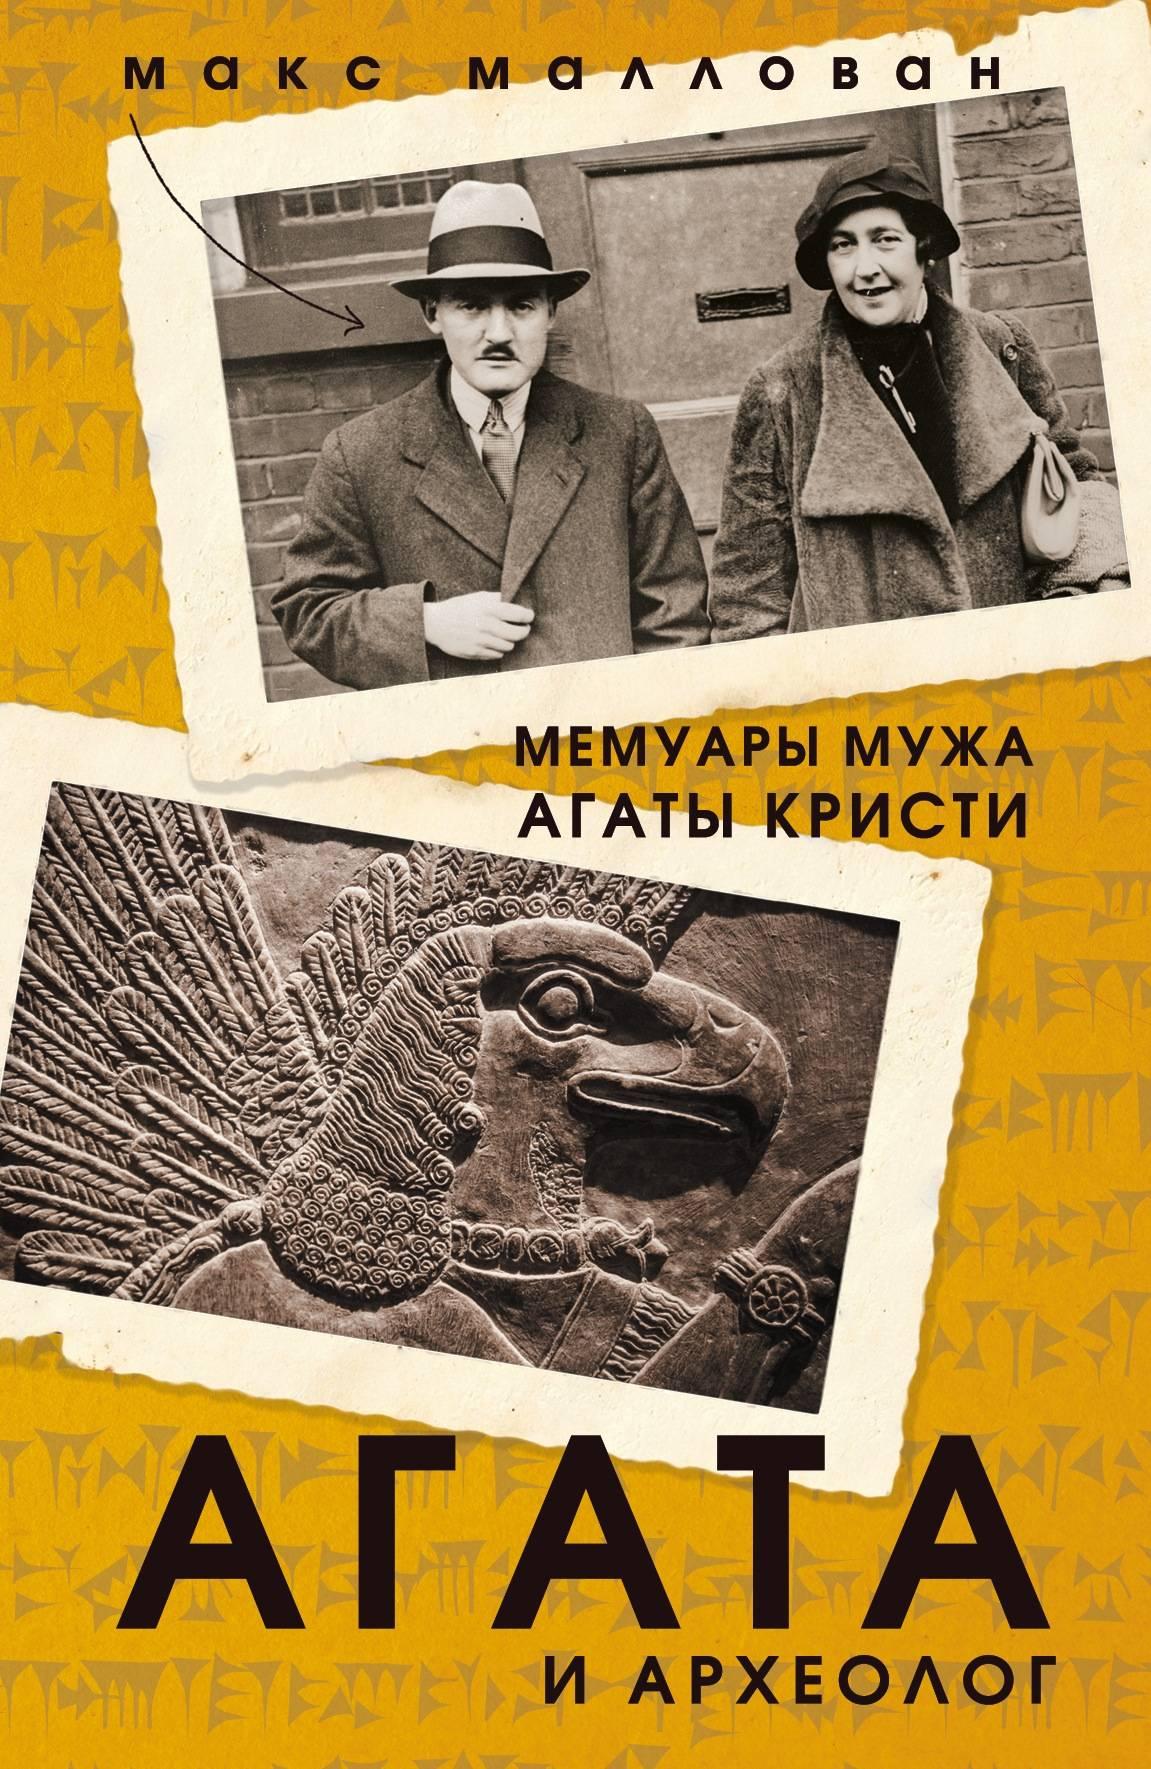 Agata i arkheolog. Memuary muzha Agaty Kristi